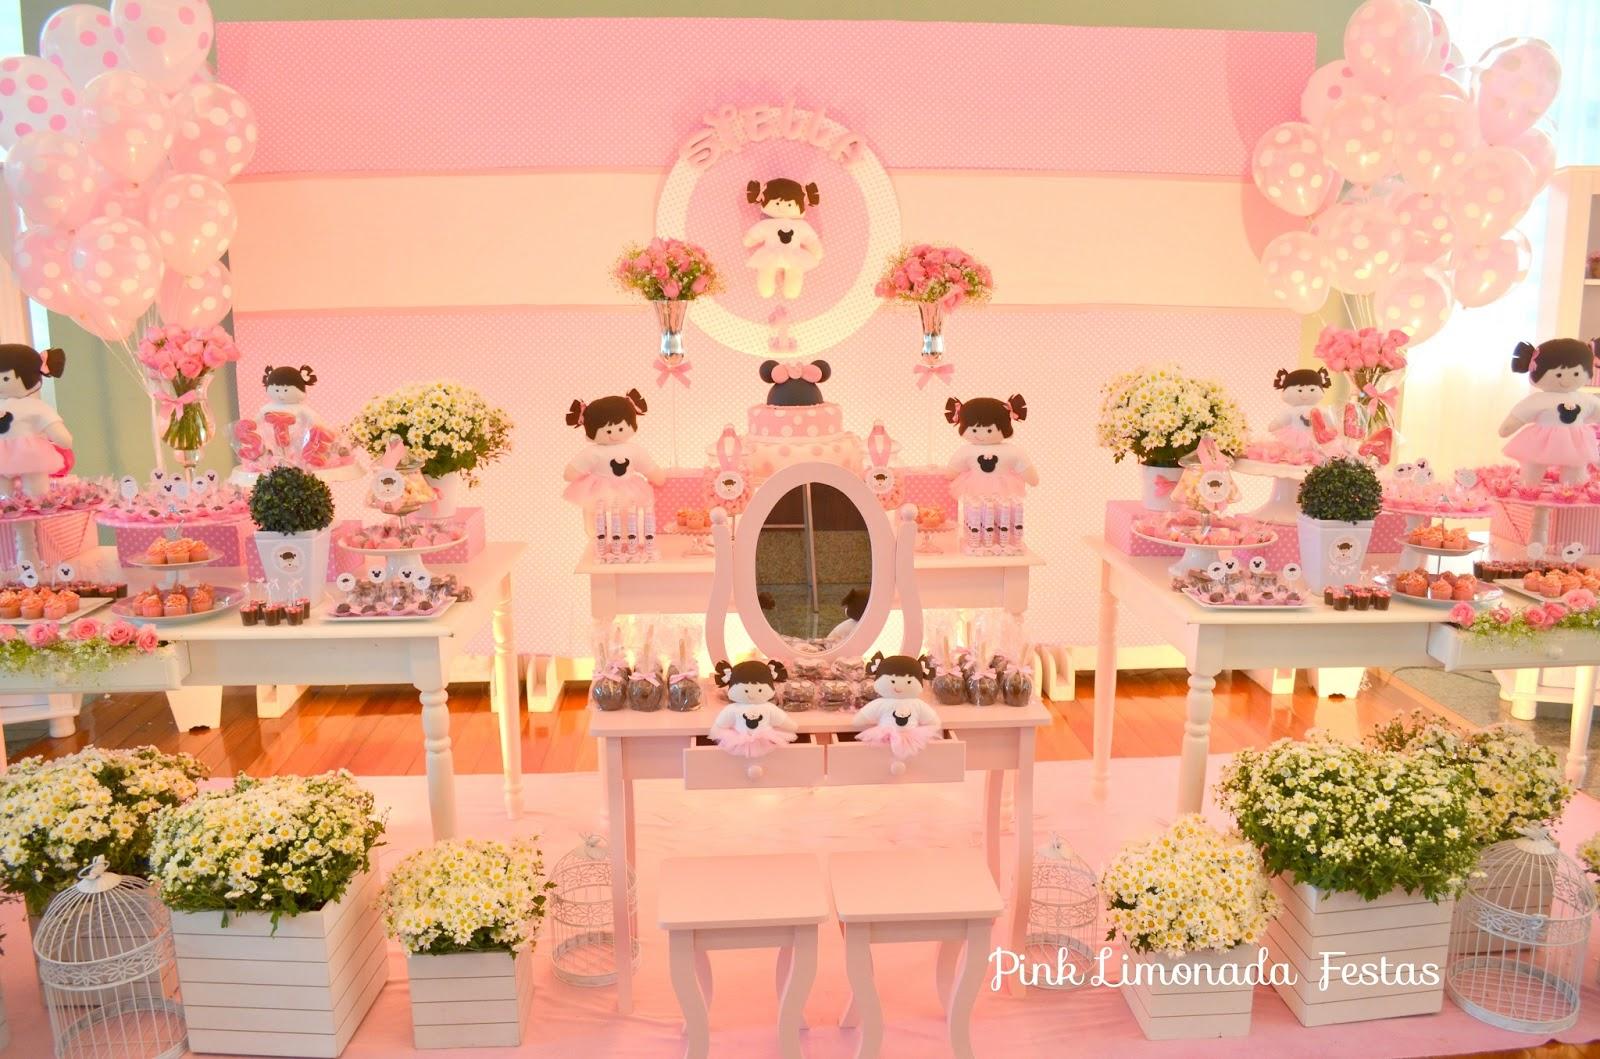 decoracao festa minnie rosa : decoracao festa minnie rosa:decoracao de festa infantil da minie rosa e branco wallpapers real